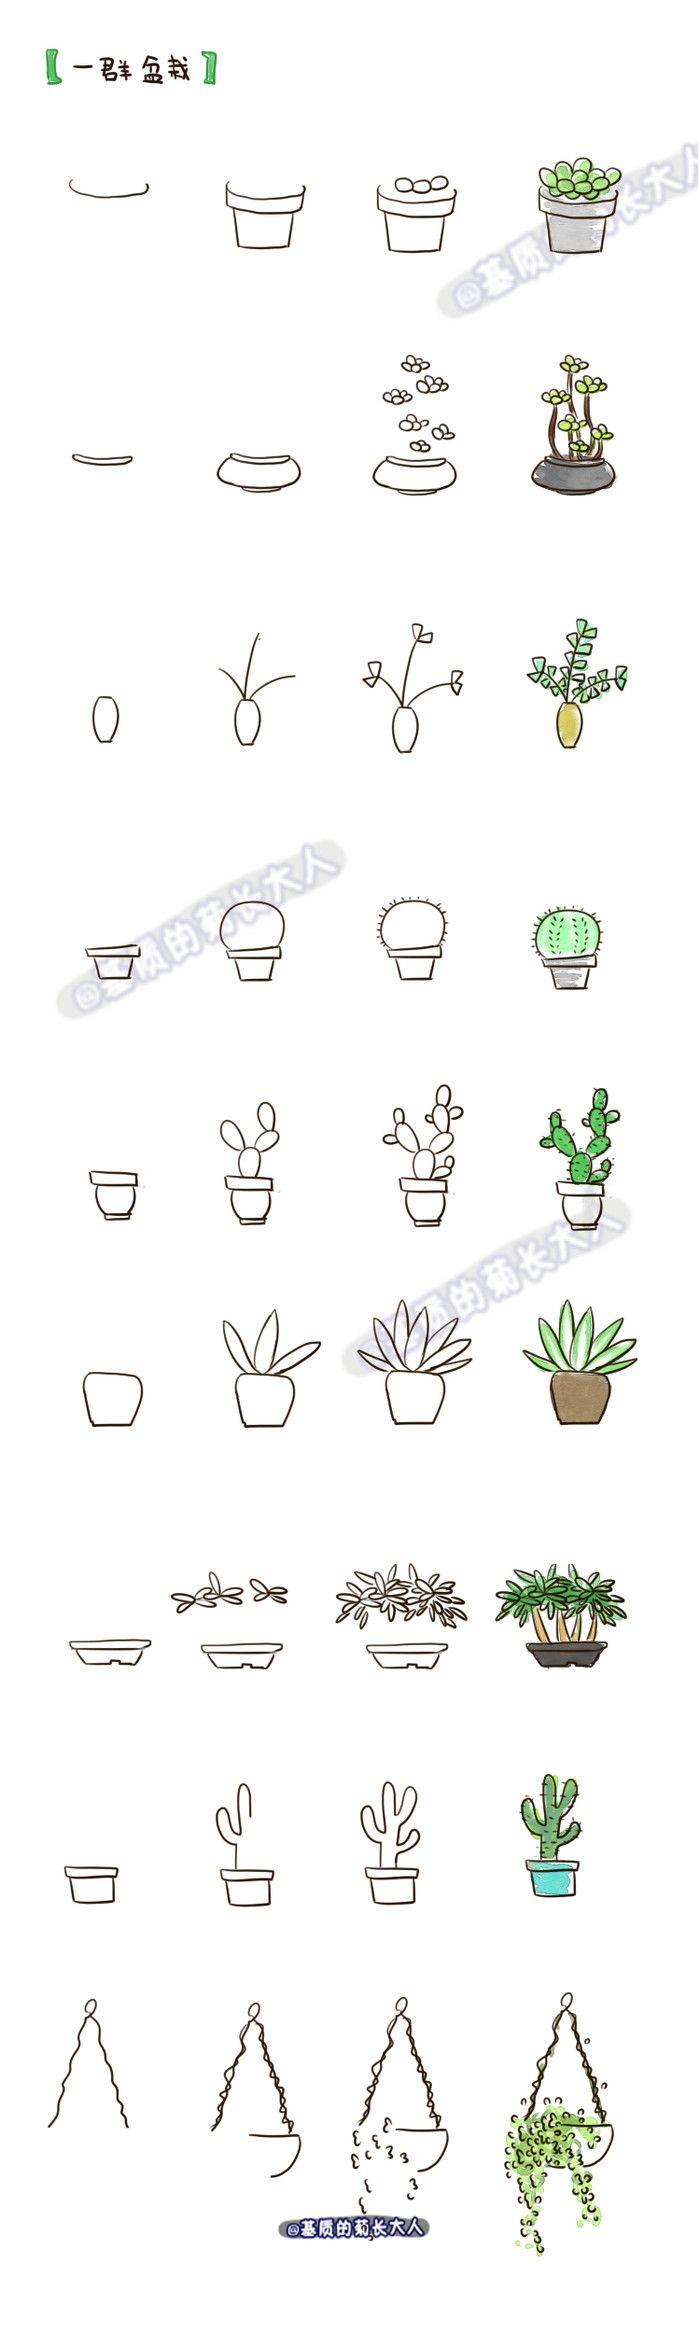 Drawn pot plant creative Of creative!  Videos Videos